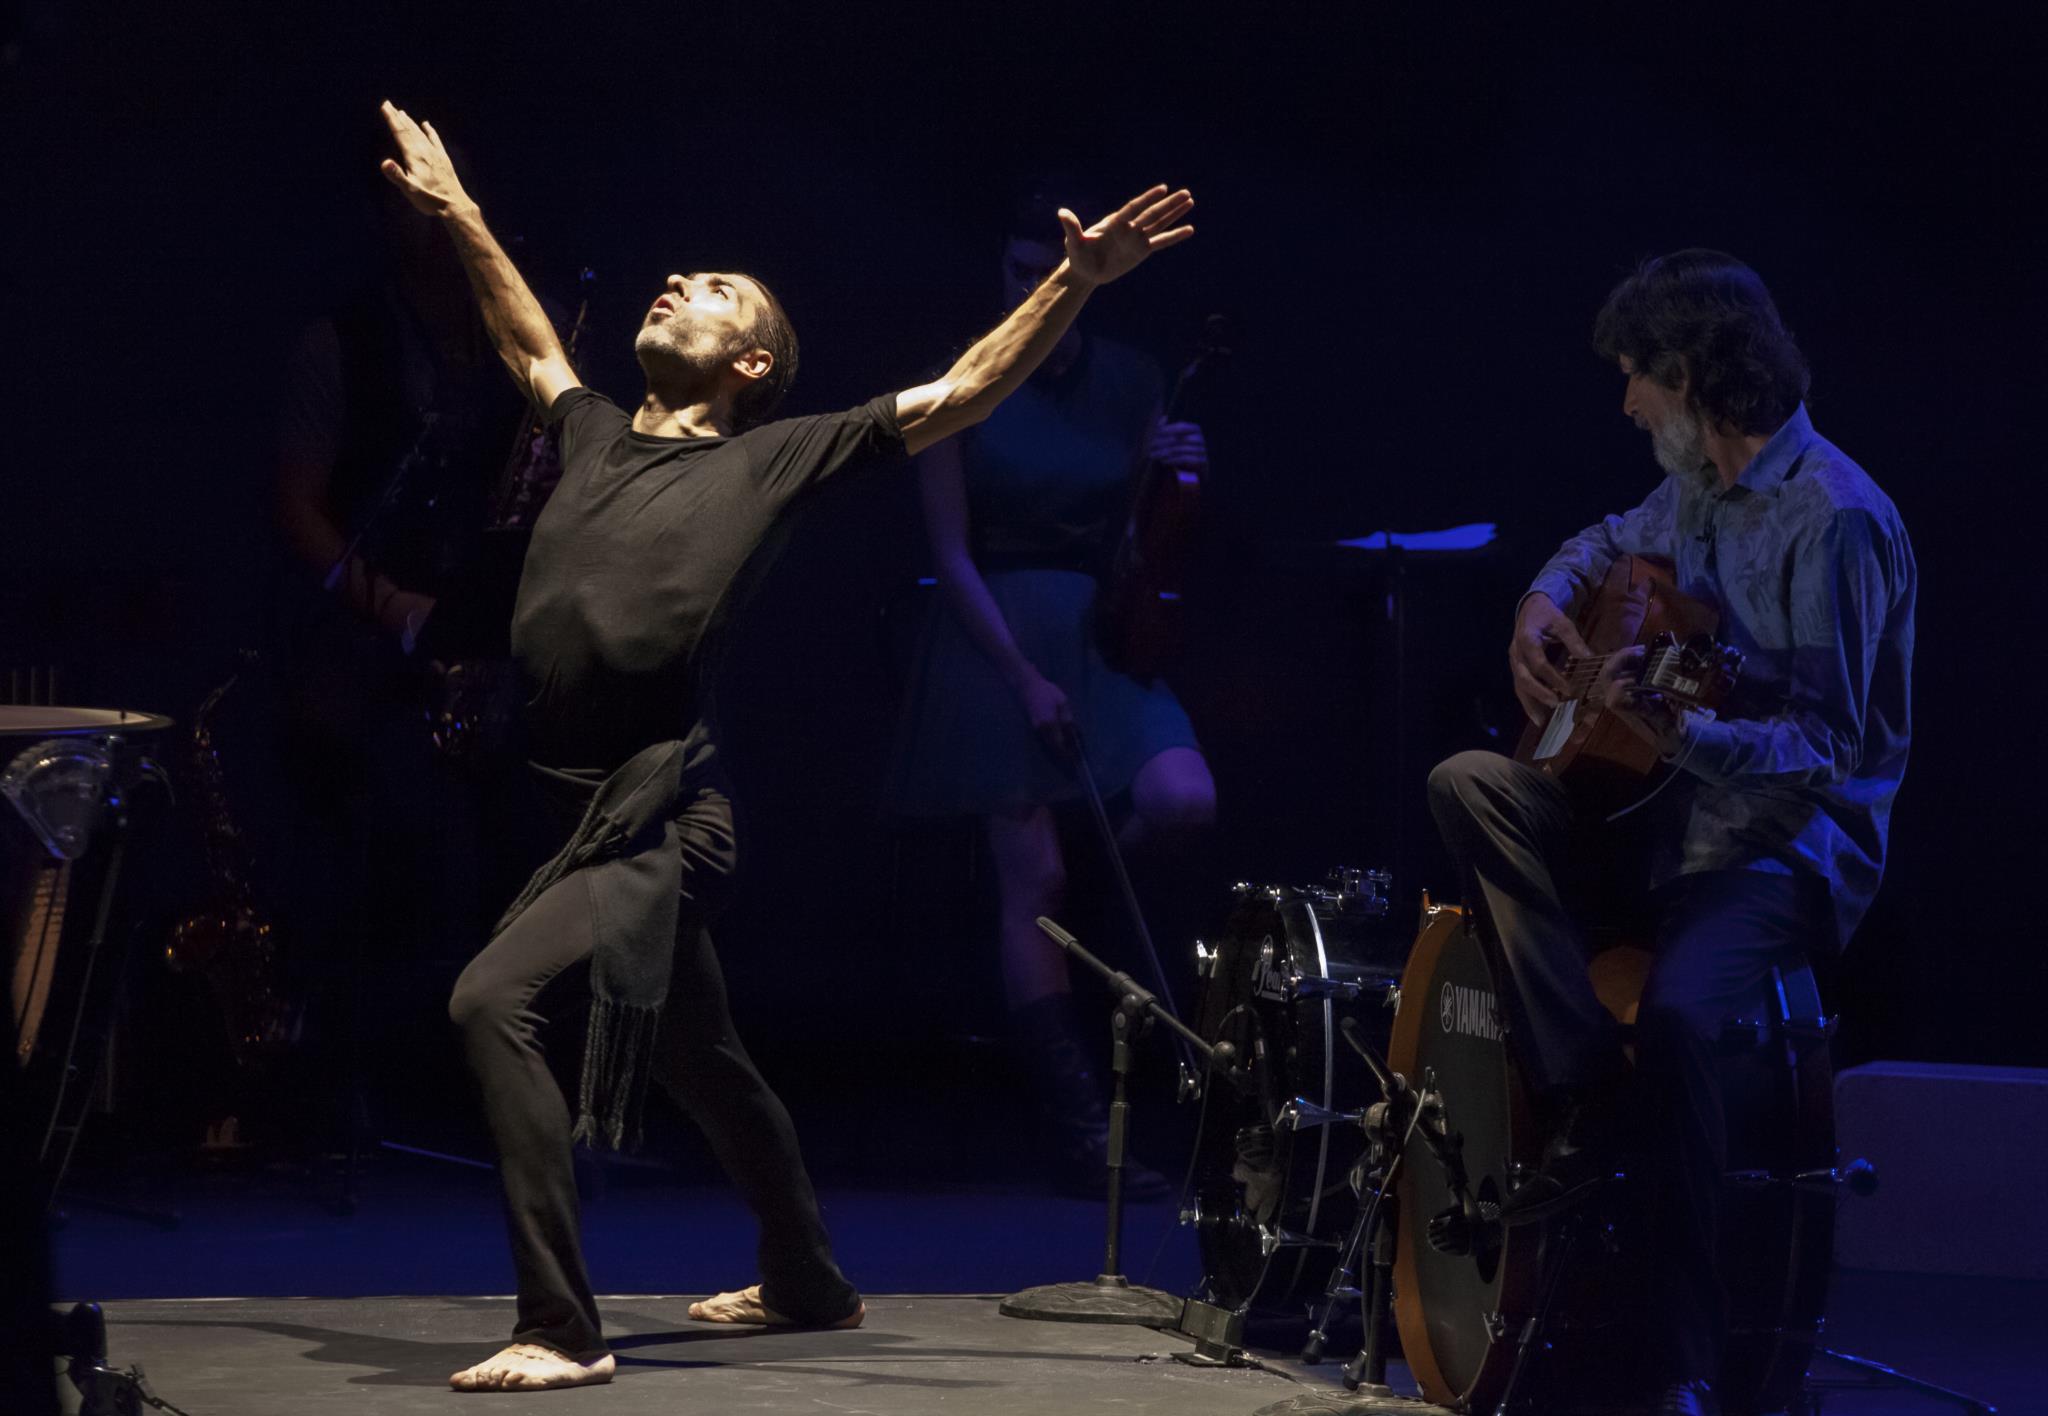 PÚBLICO - A anarquia do flamenco segundo Israel Galván